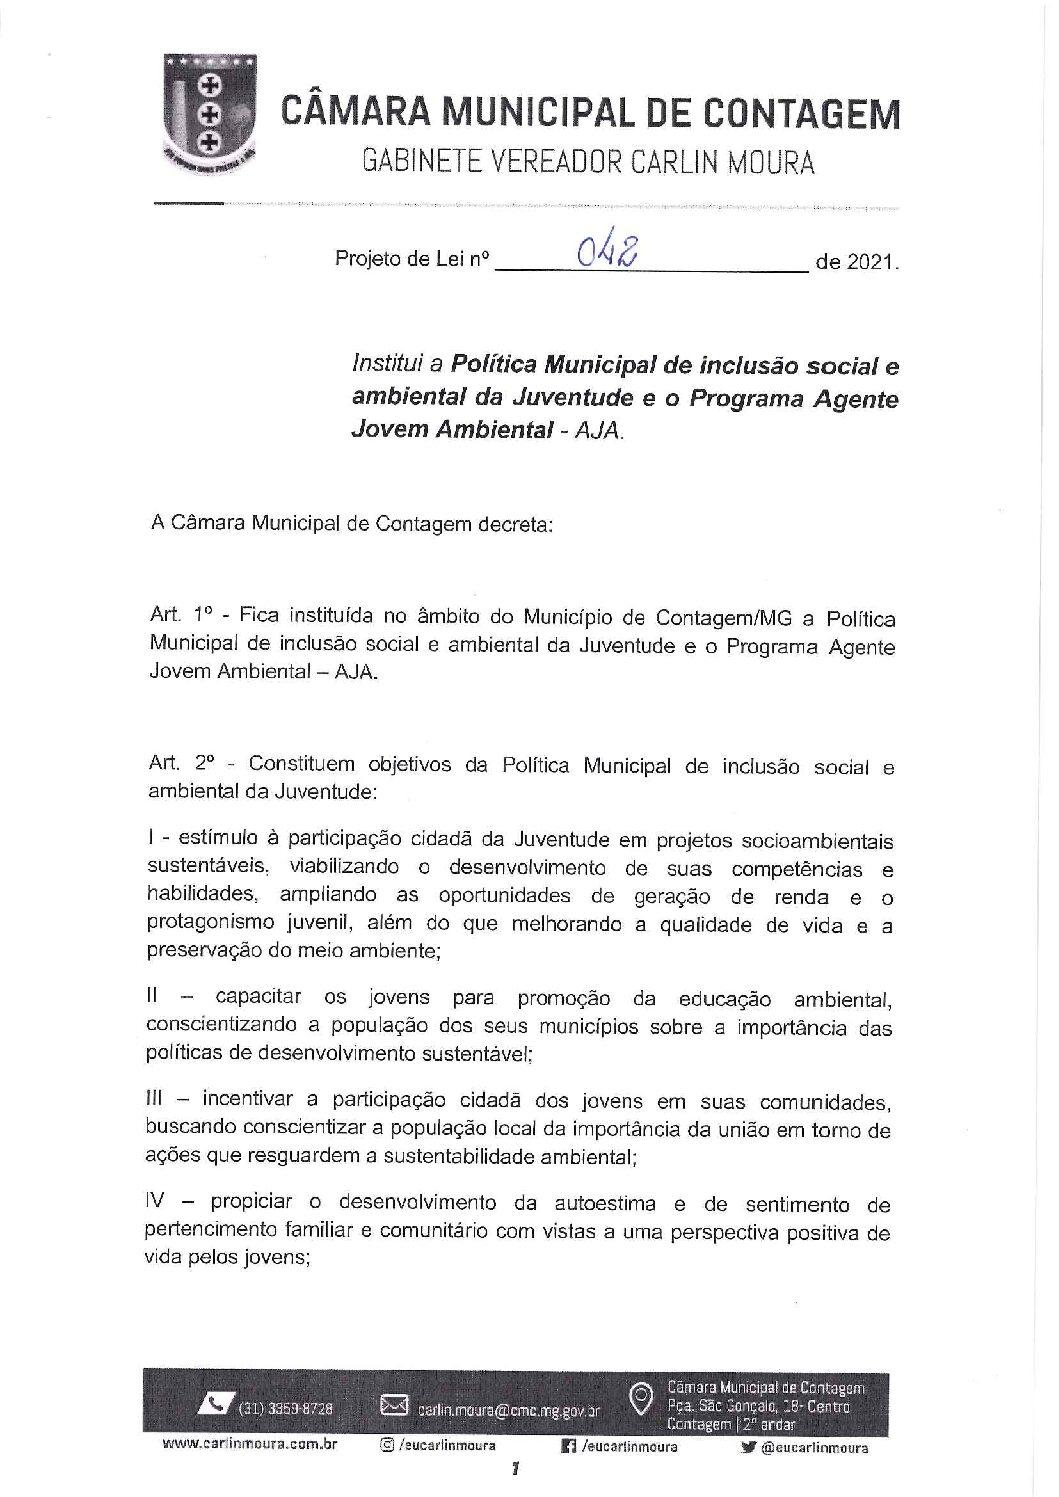 Projeto de lei 0042/2021